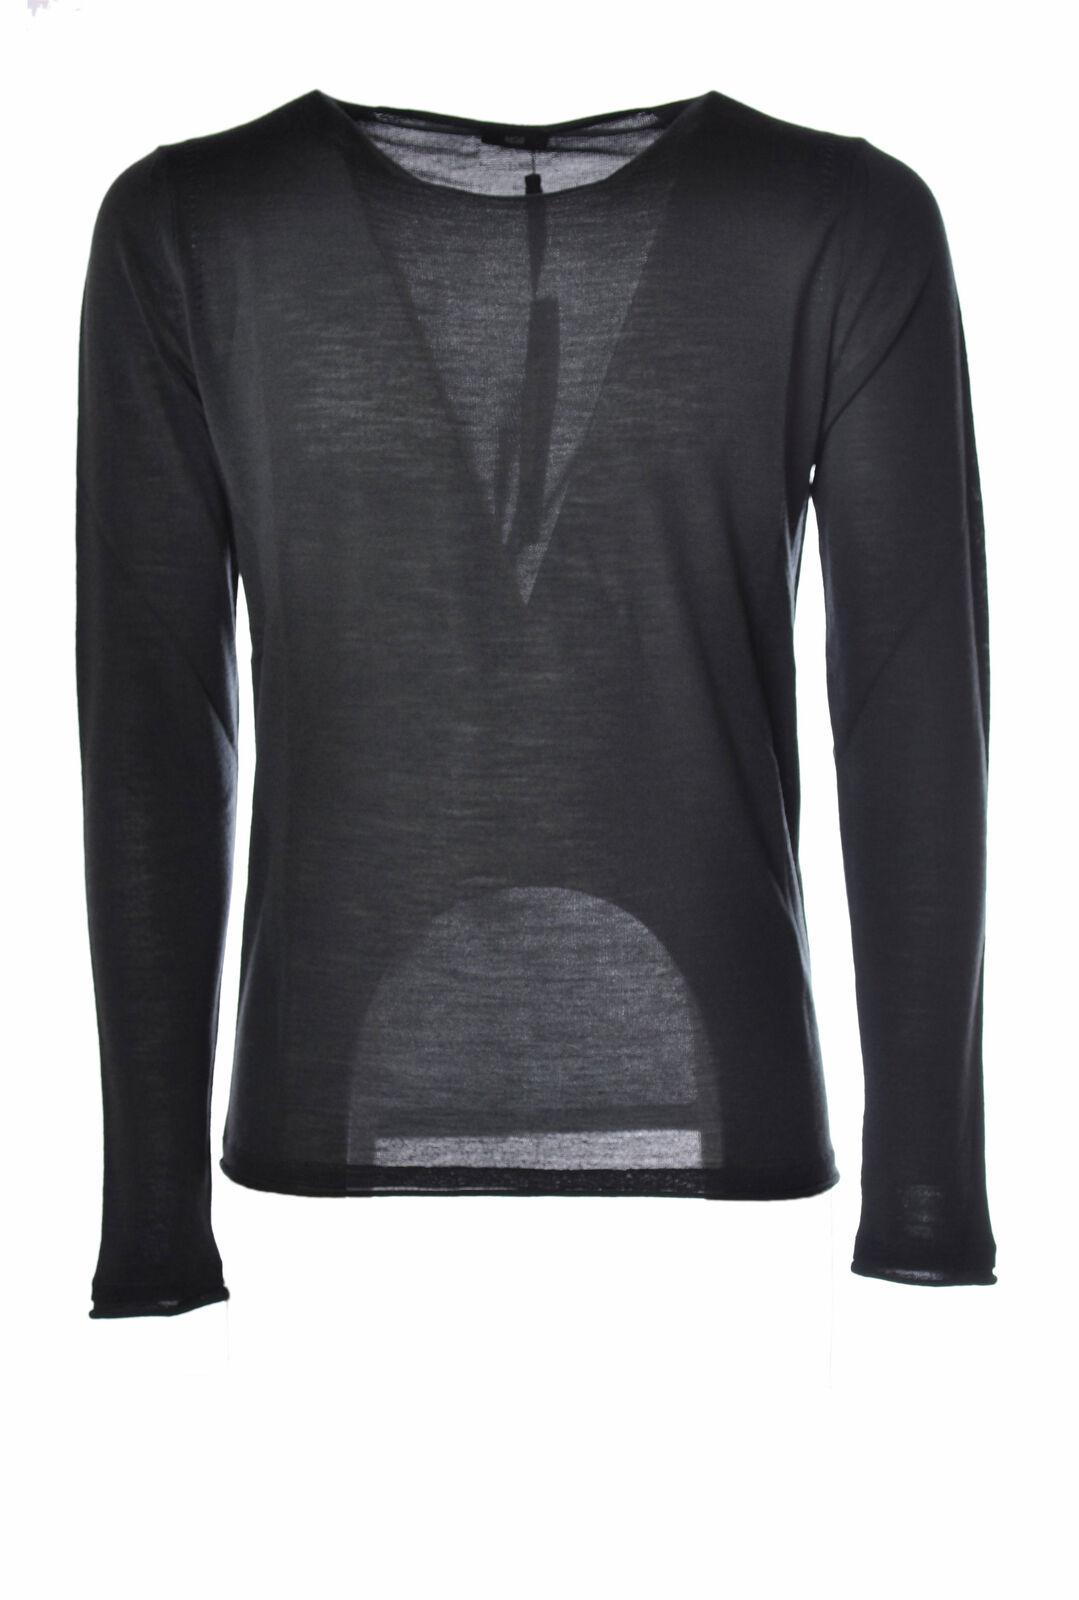 Hosio  -  Sweaters - Male - Grün - 2500521A185259